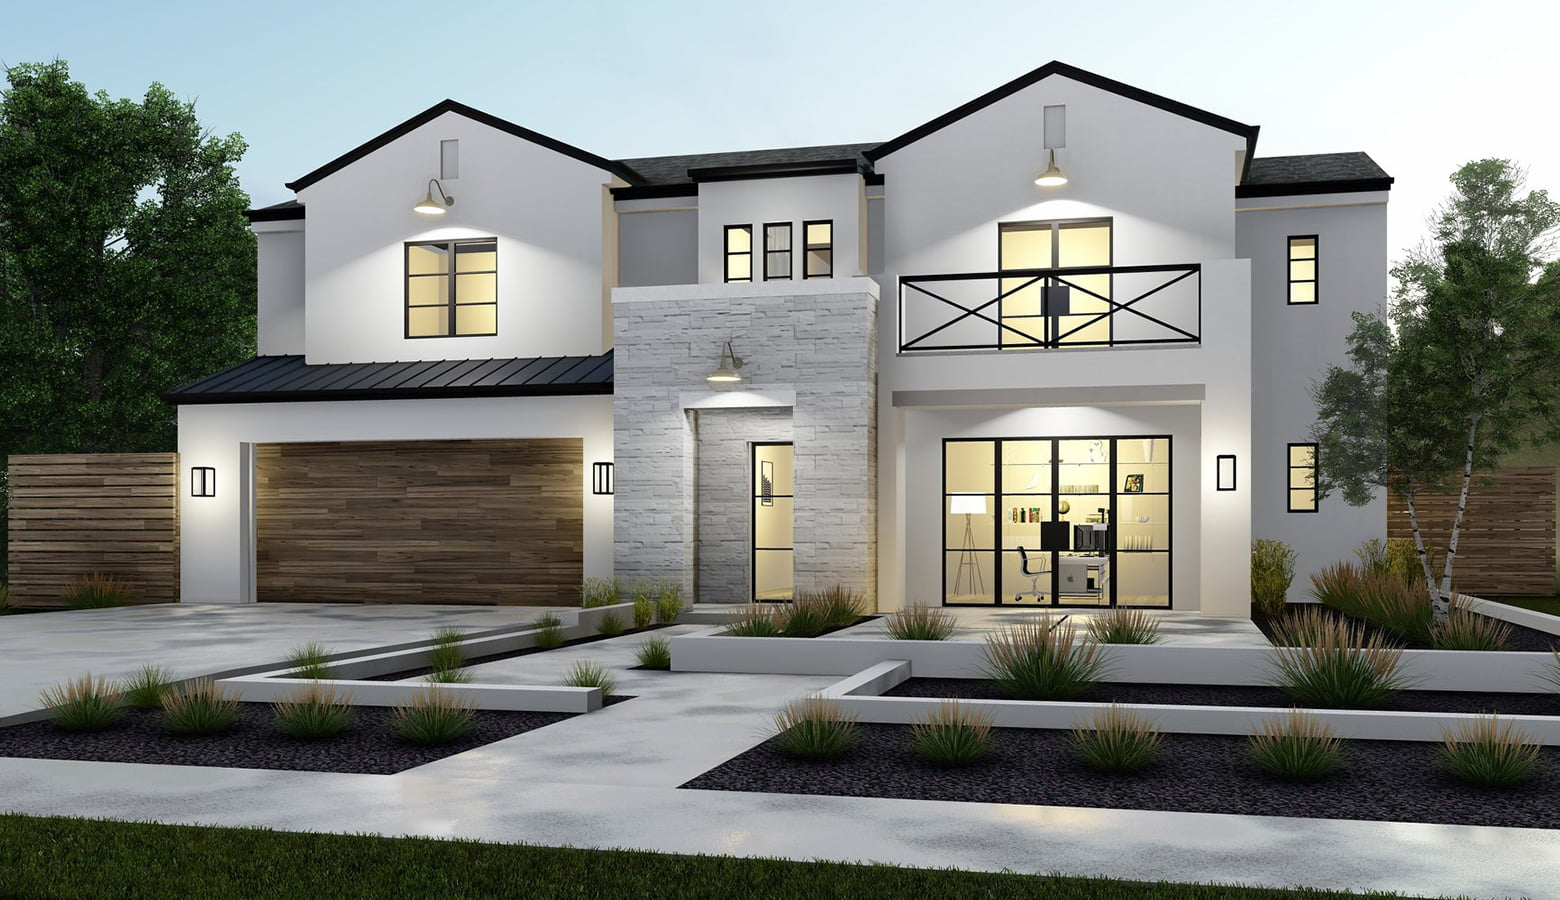 image 3 high quality exterior - PRICING